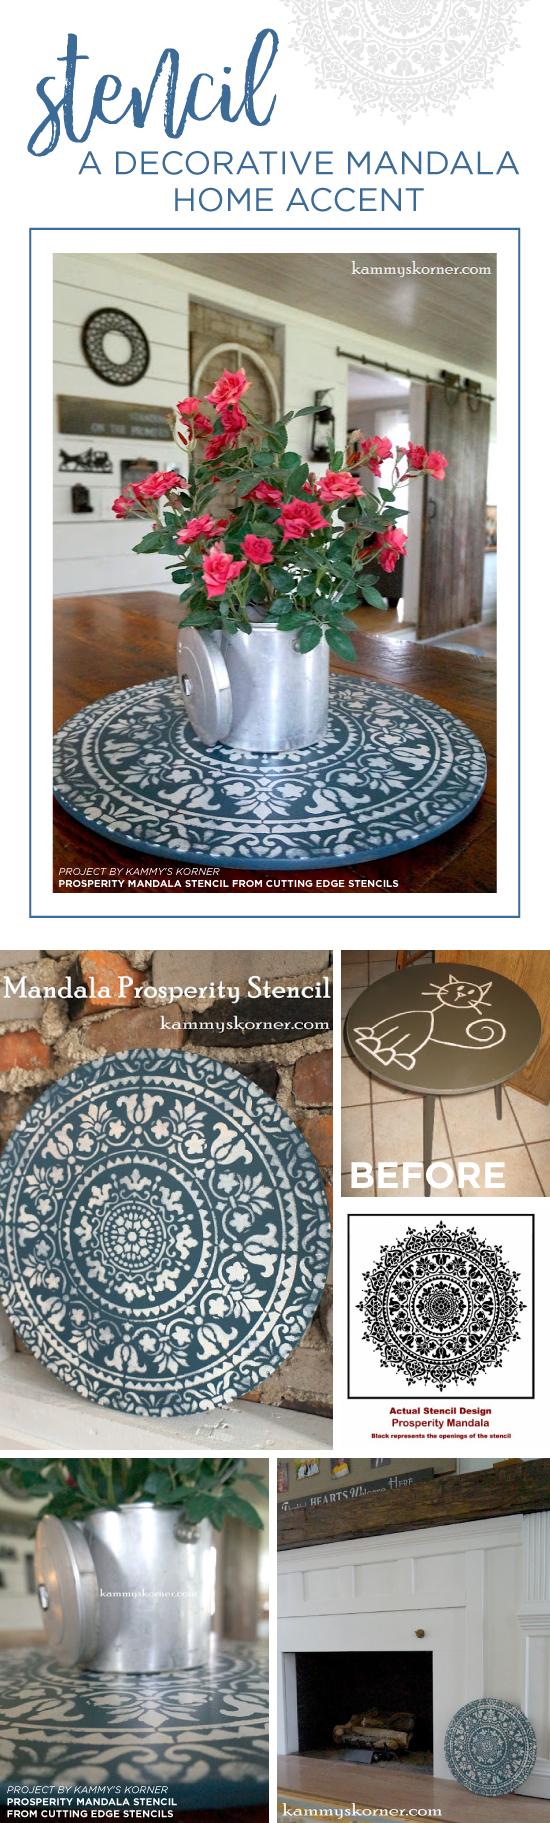 Cutting Edge Stencils shares a DIY stenciled home decor accent using the Prosperity Mandala pattern. http://www.cuttingedgestencils.com/prosperity-mandala-stencil-yoga-mandala-stencils-designs.html